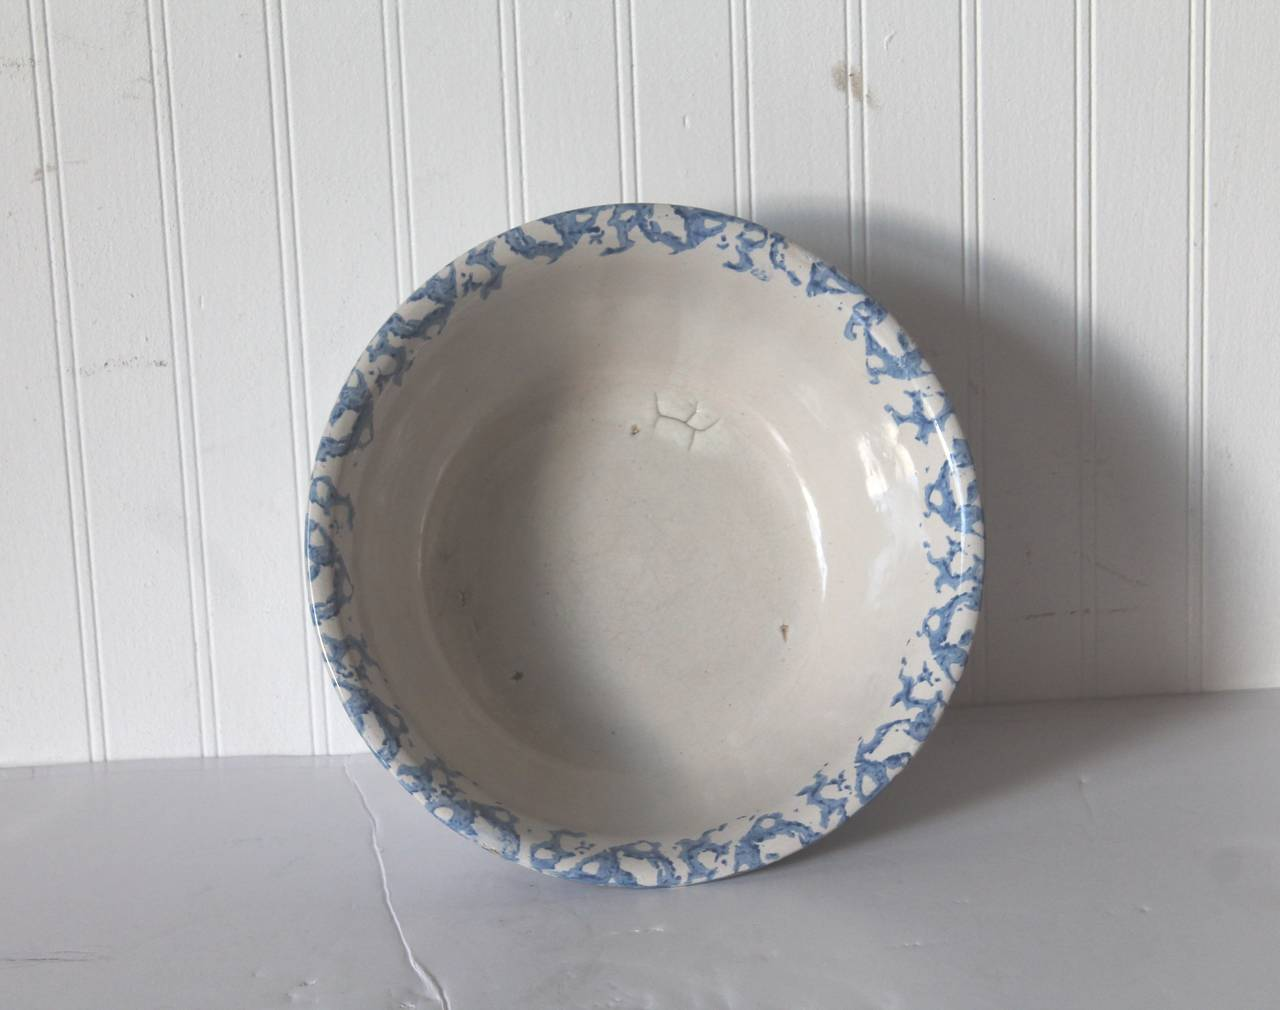 Folk Art 19th Century Large Sponge Ware Serving Bowl For Sale